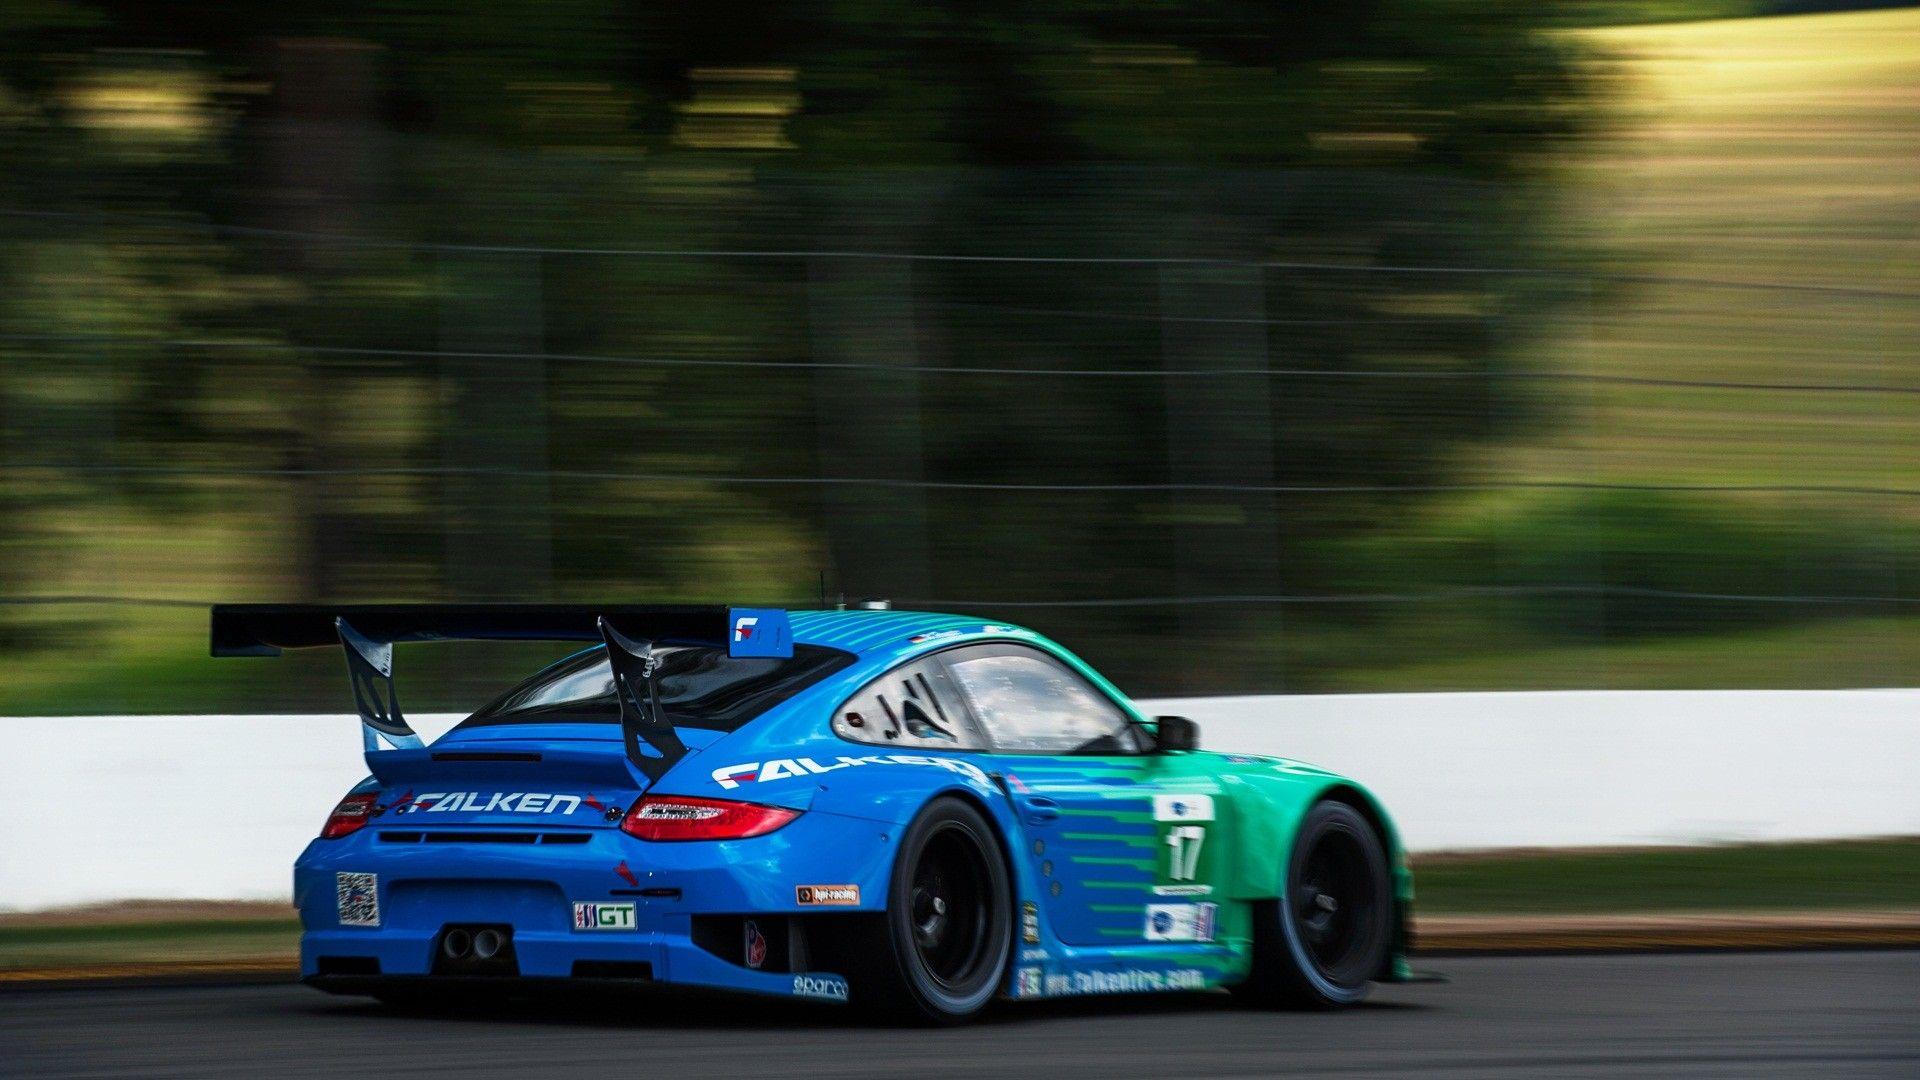 Porsche Car Racing Wallpaper Racing